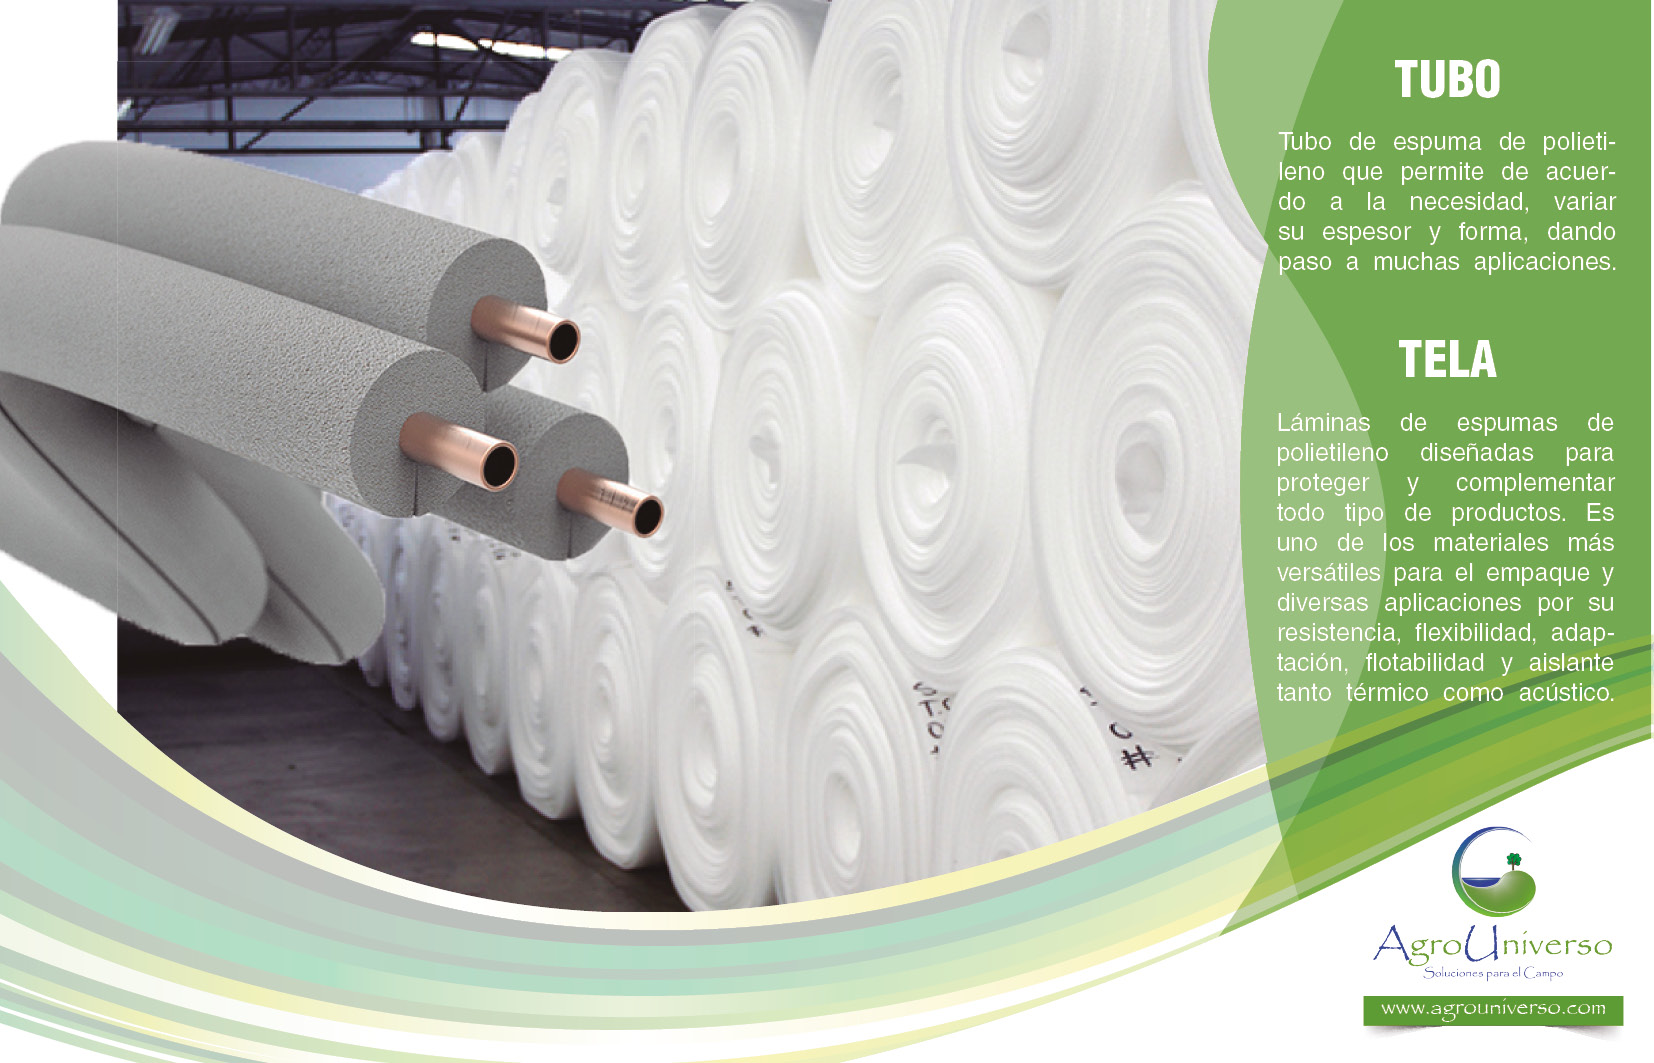 Catlogo-de-productos-Agrouniverso-36